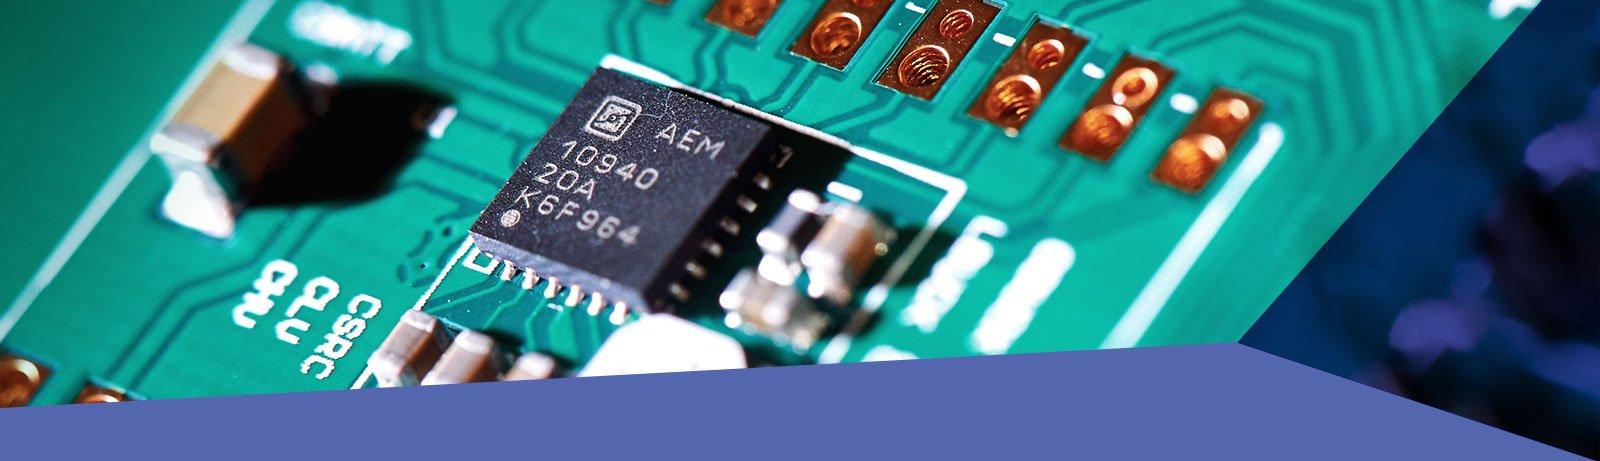 e-peas – Power Management IC: mehr Leistungsfähigkeit & effizienteres Energy Harvesting